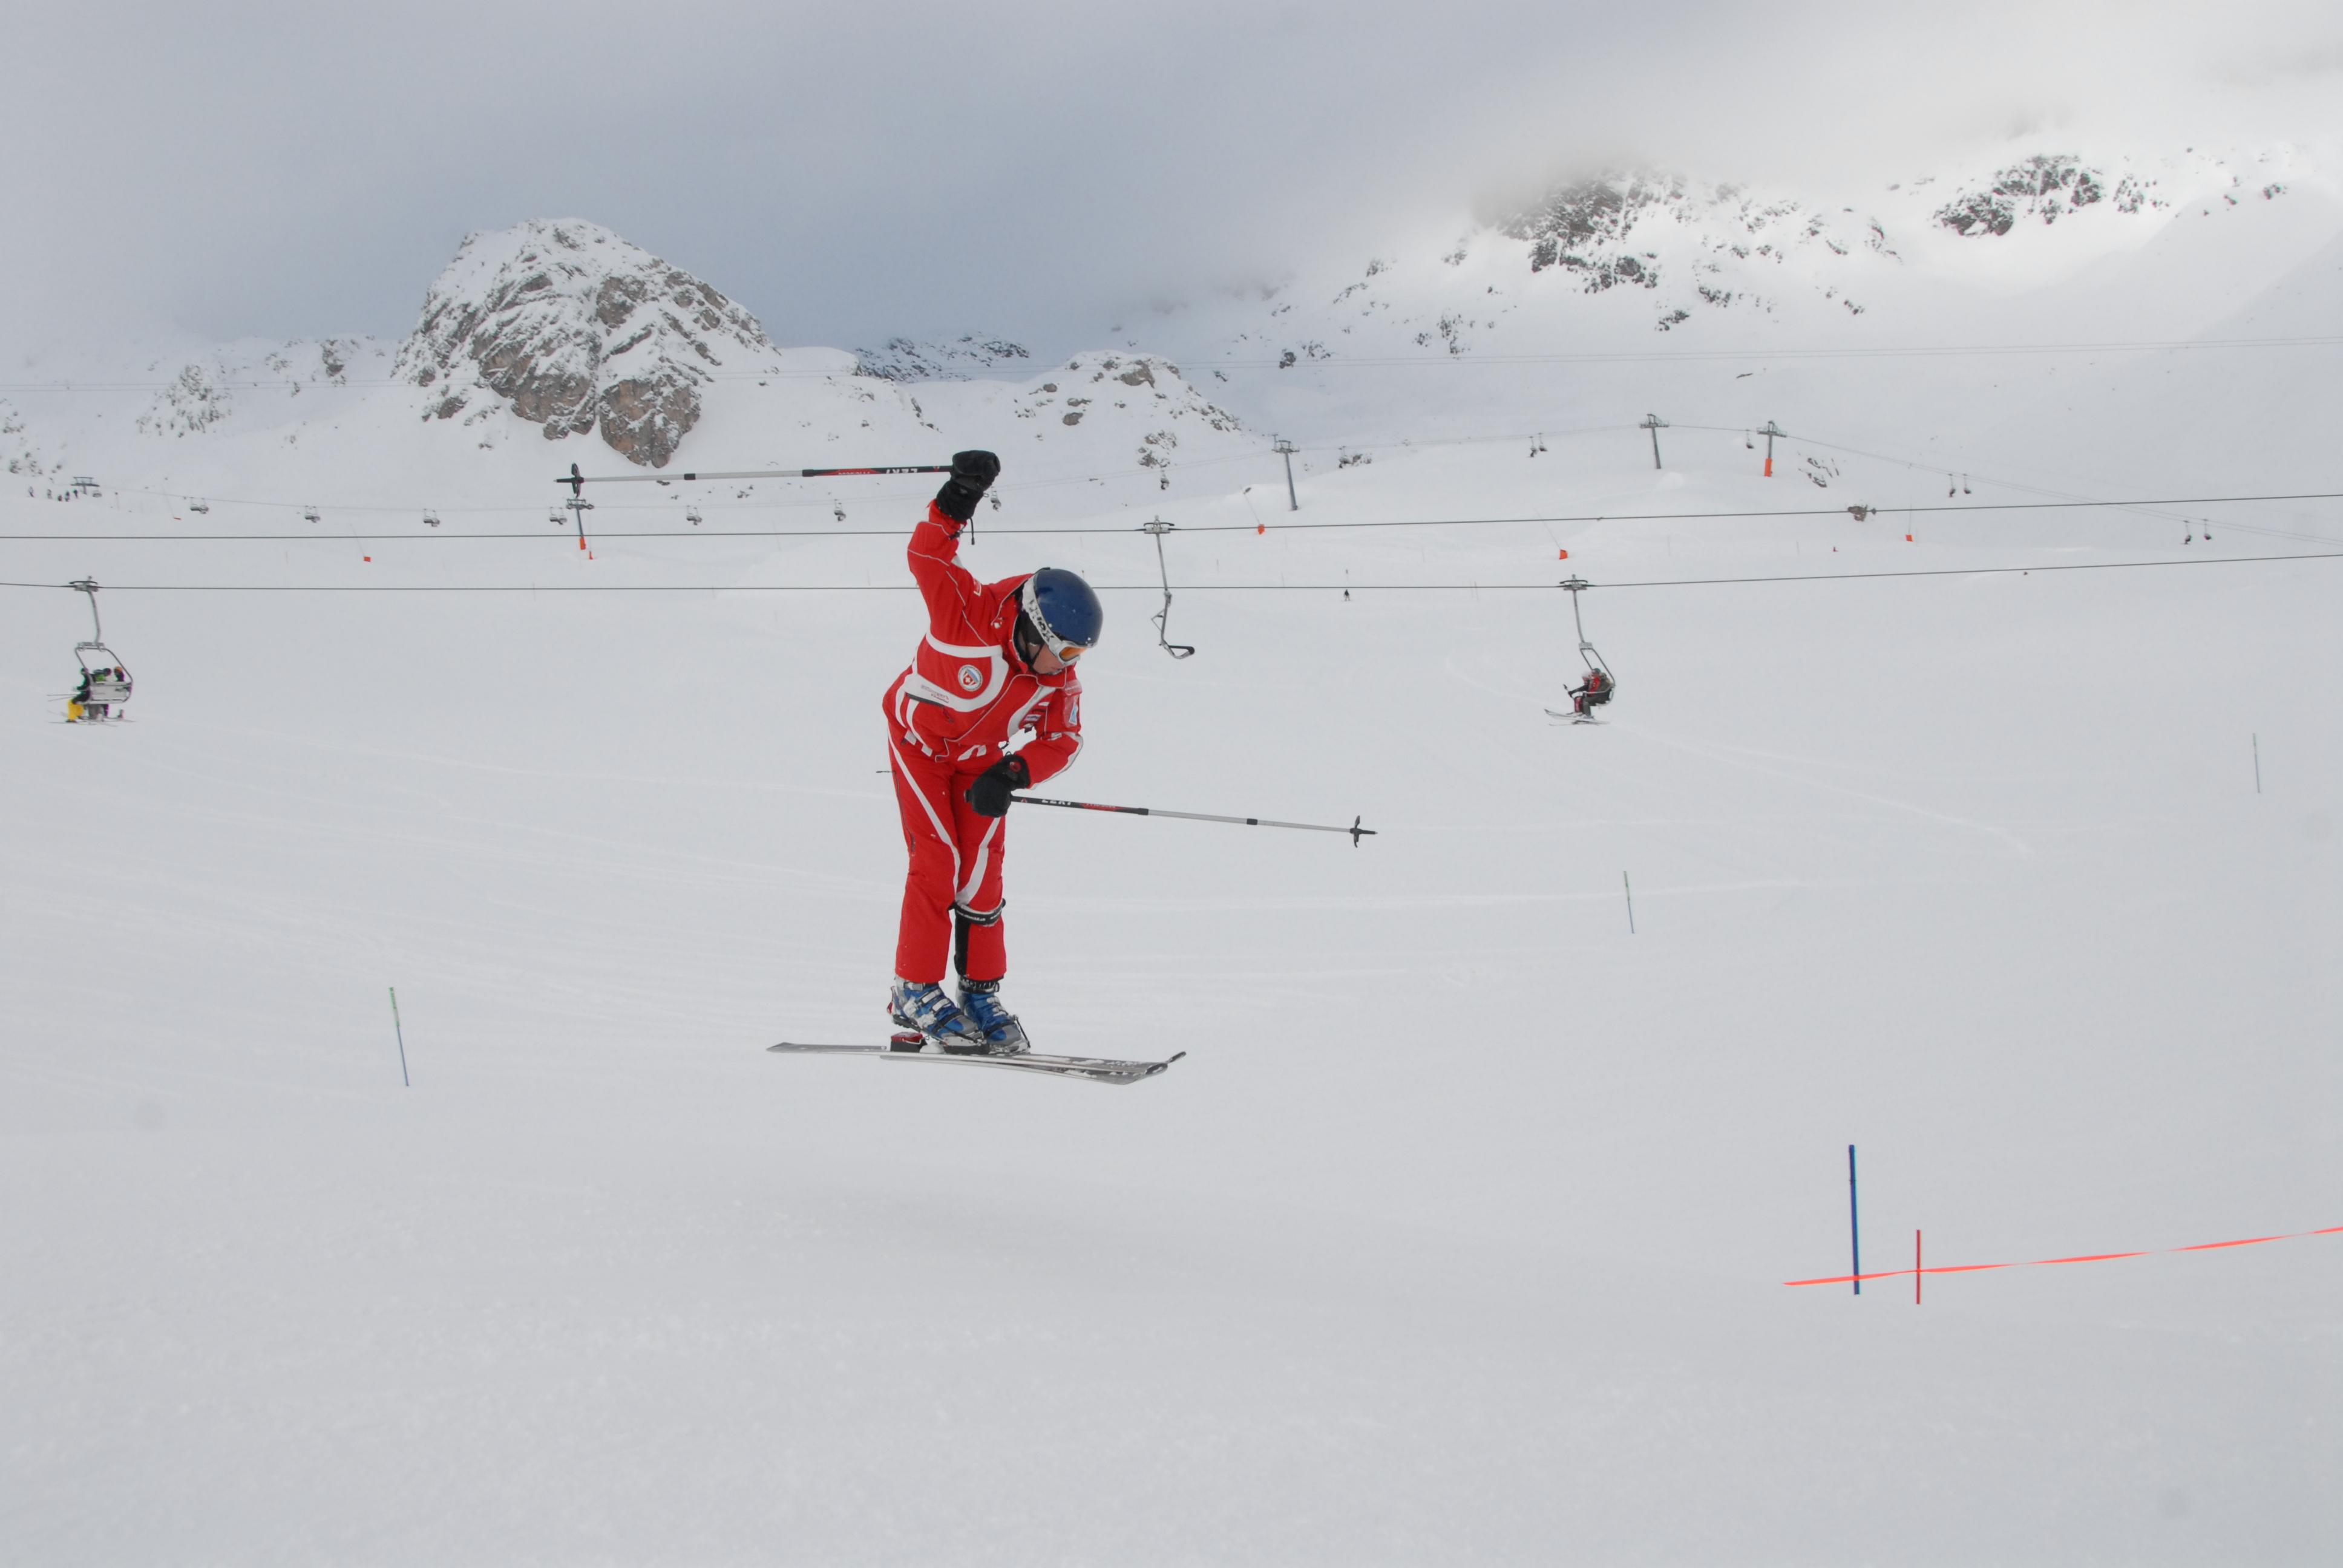 Skischule Bär Snowsports Engadin Slide 5